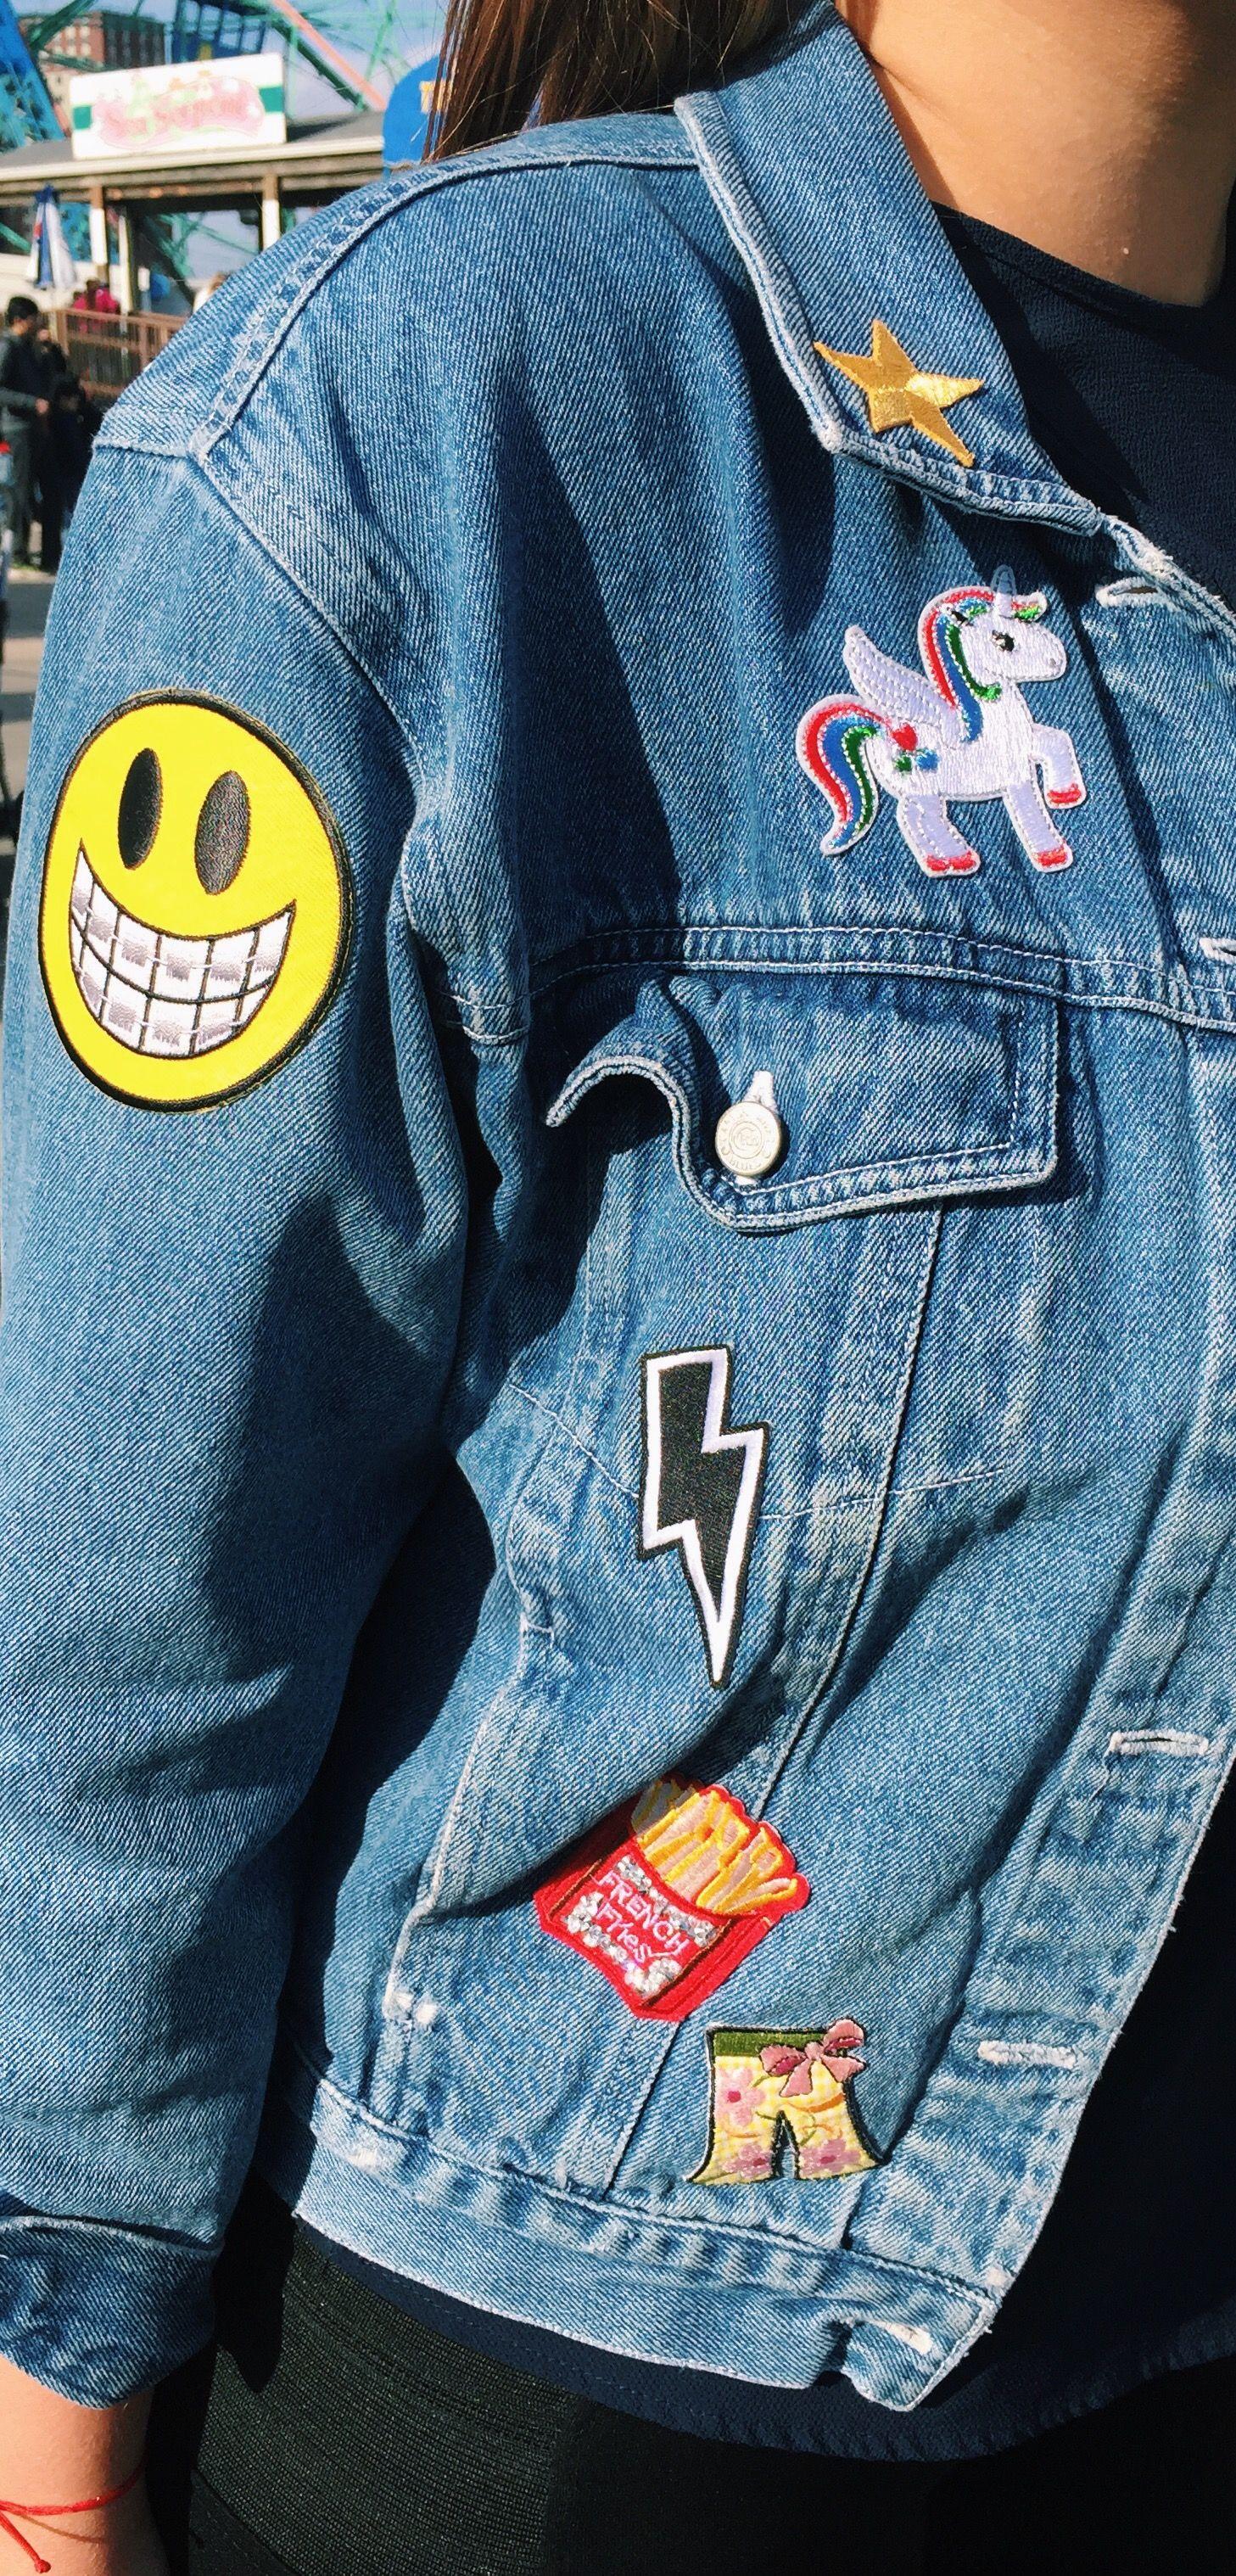 Diy Trend Patched Denim Jacket Sabor With Style Denim Jacket Patches Denim Jackets [ 3036 x 1457 Pixel ]